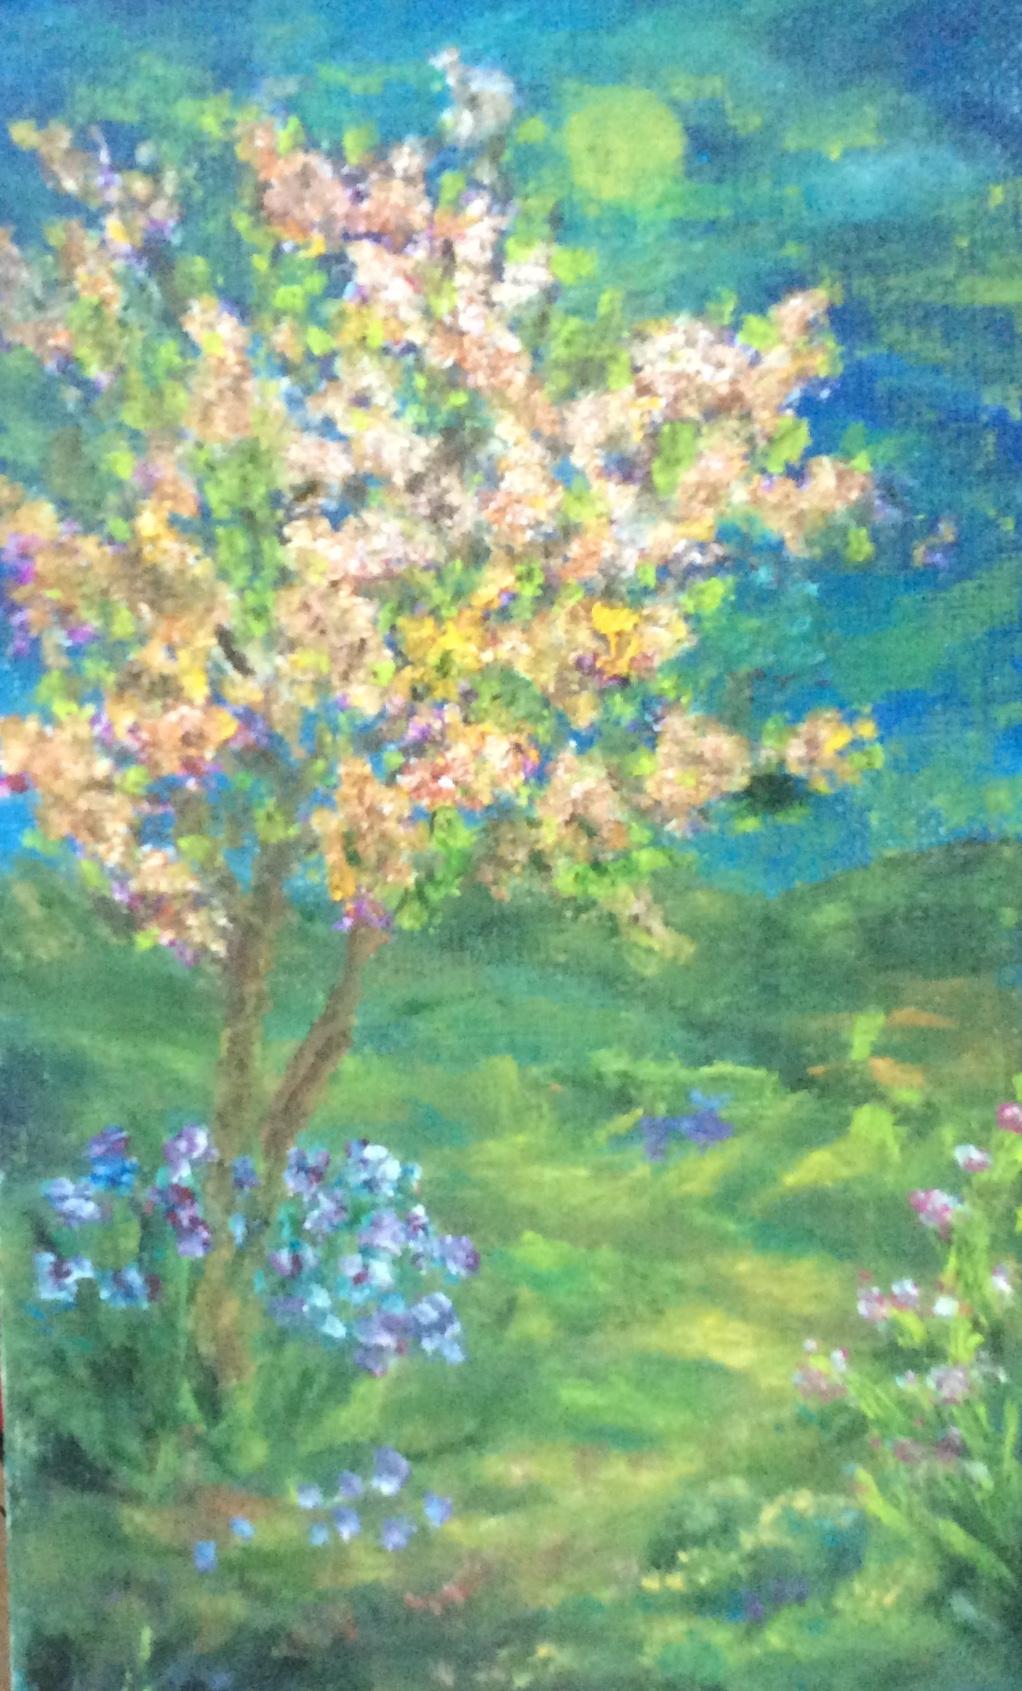 Rita Arkadievna Beckman. Moon and blooming almonds